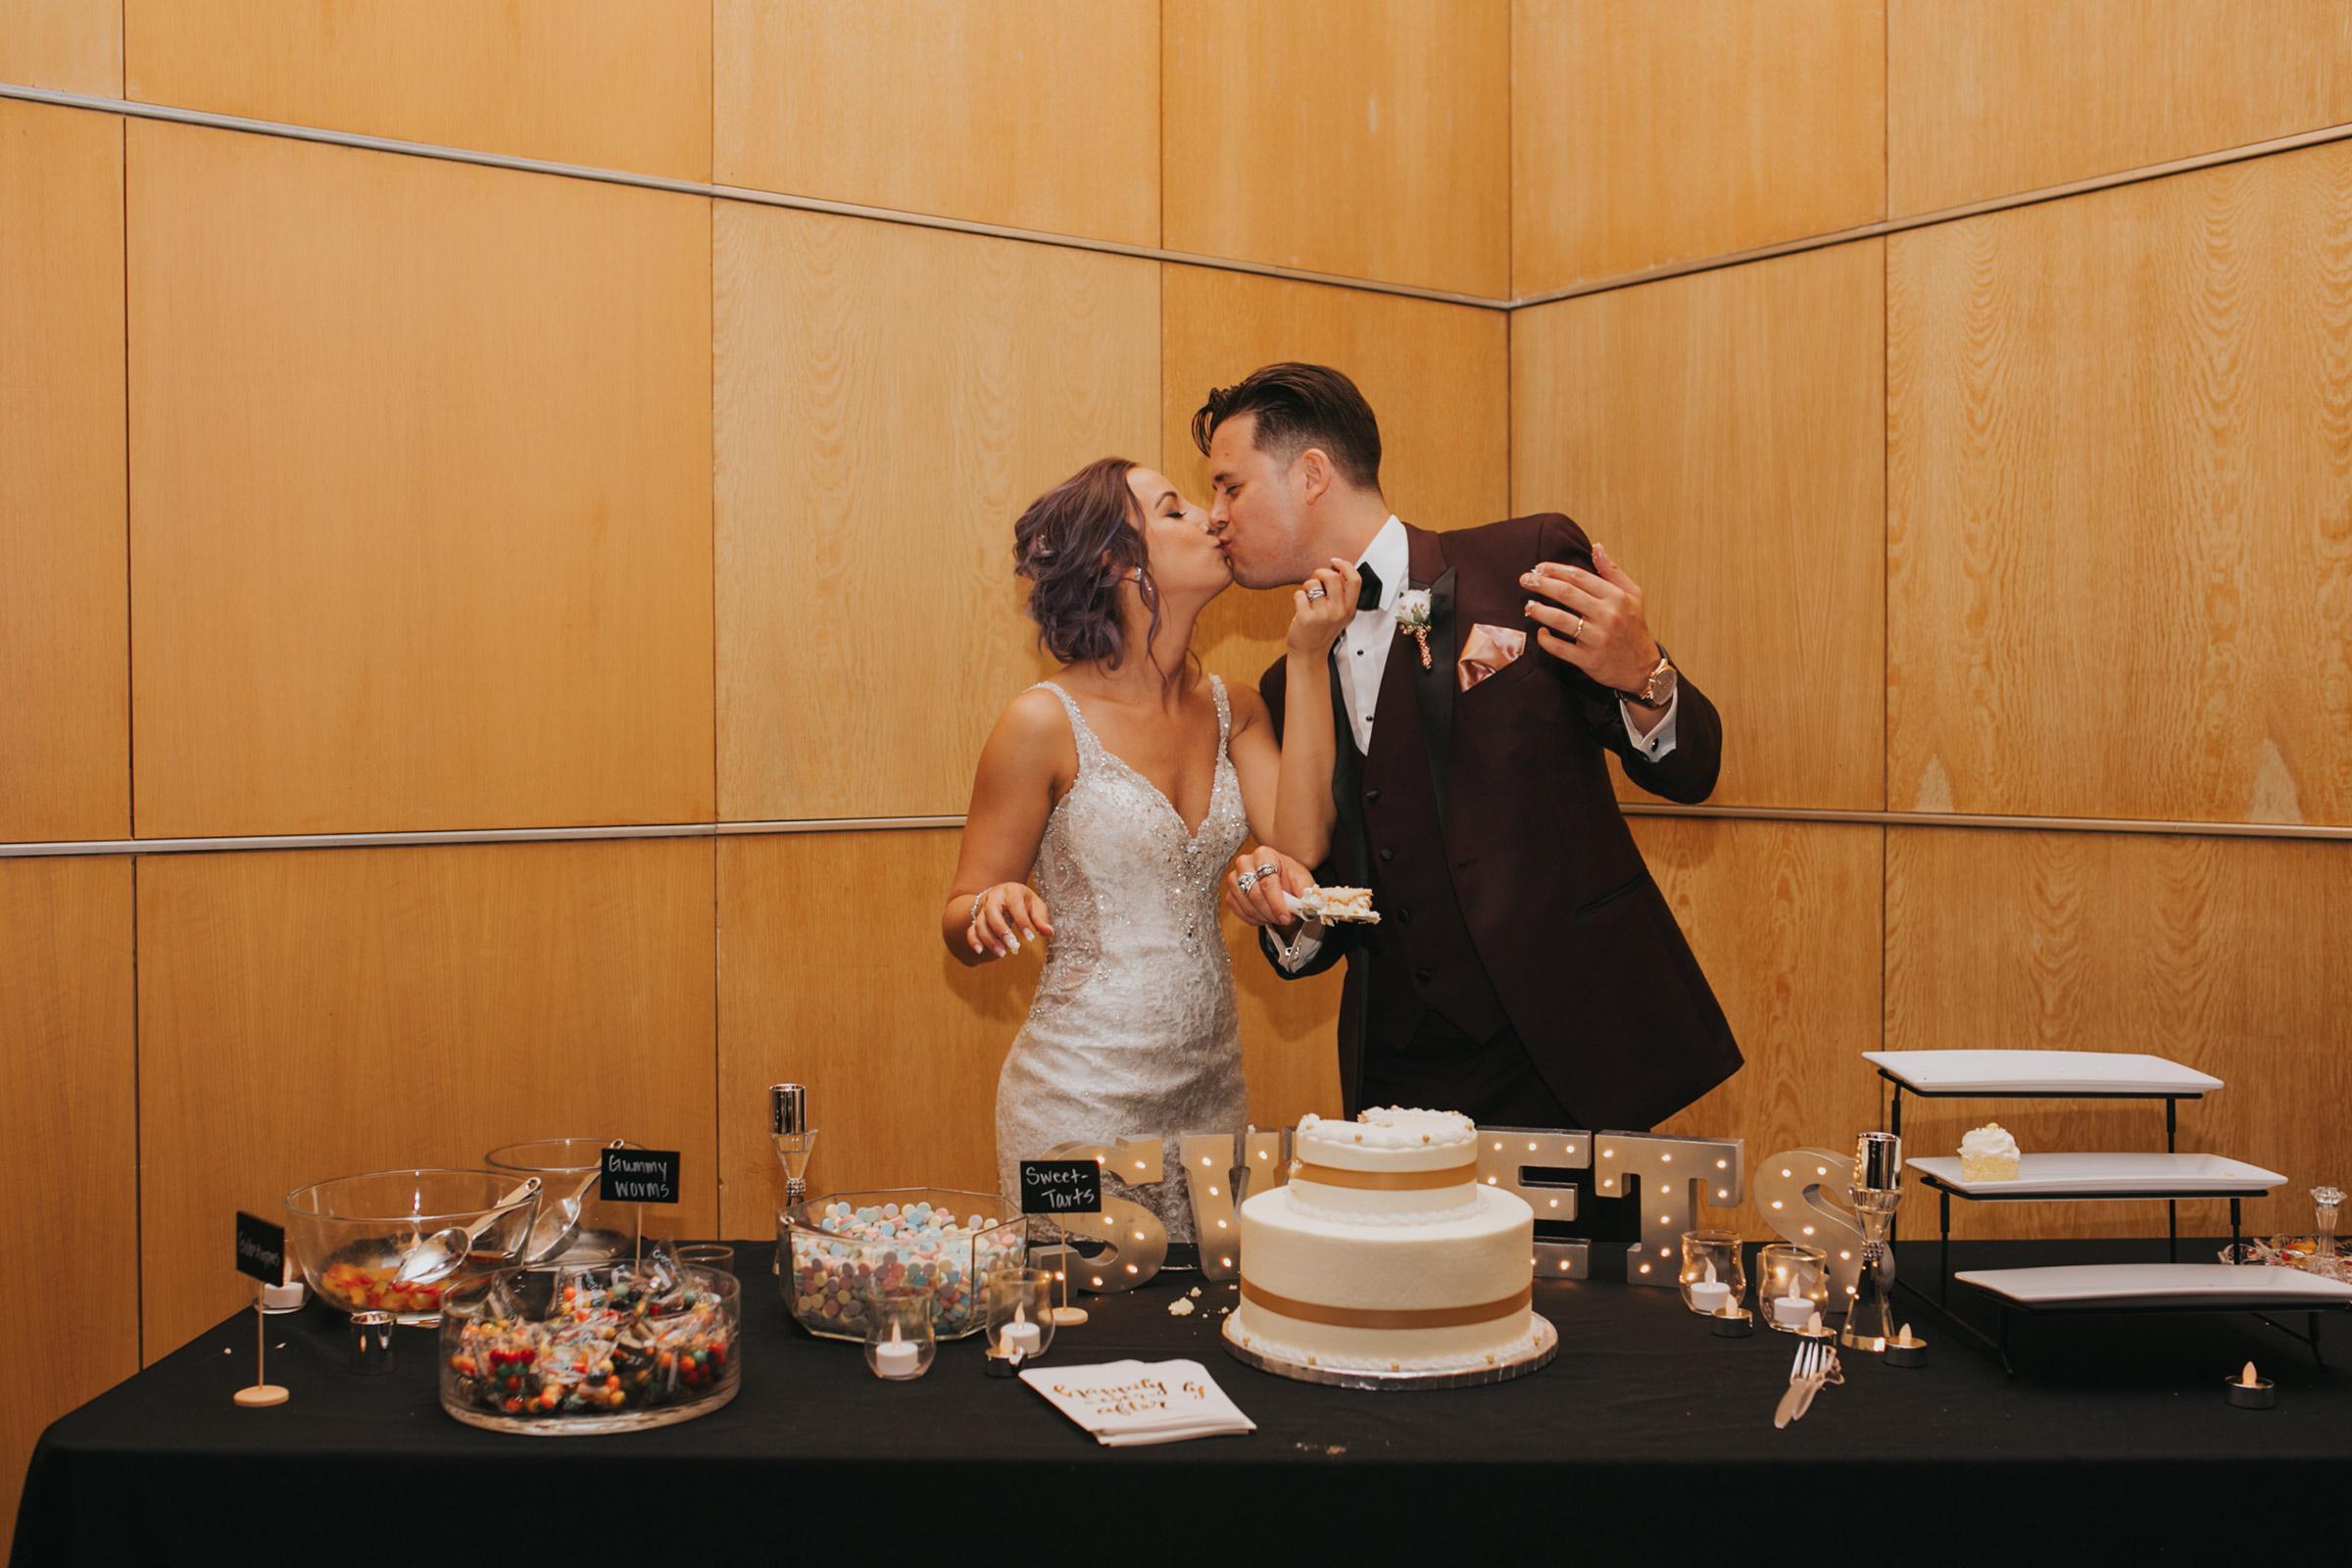 bride-groom-kissing-after-cake-cutting-desmoines-iowa-art-center-raelyn-ramey-photography.jpg